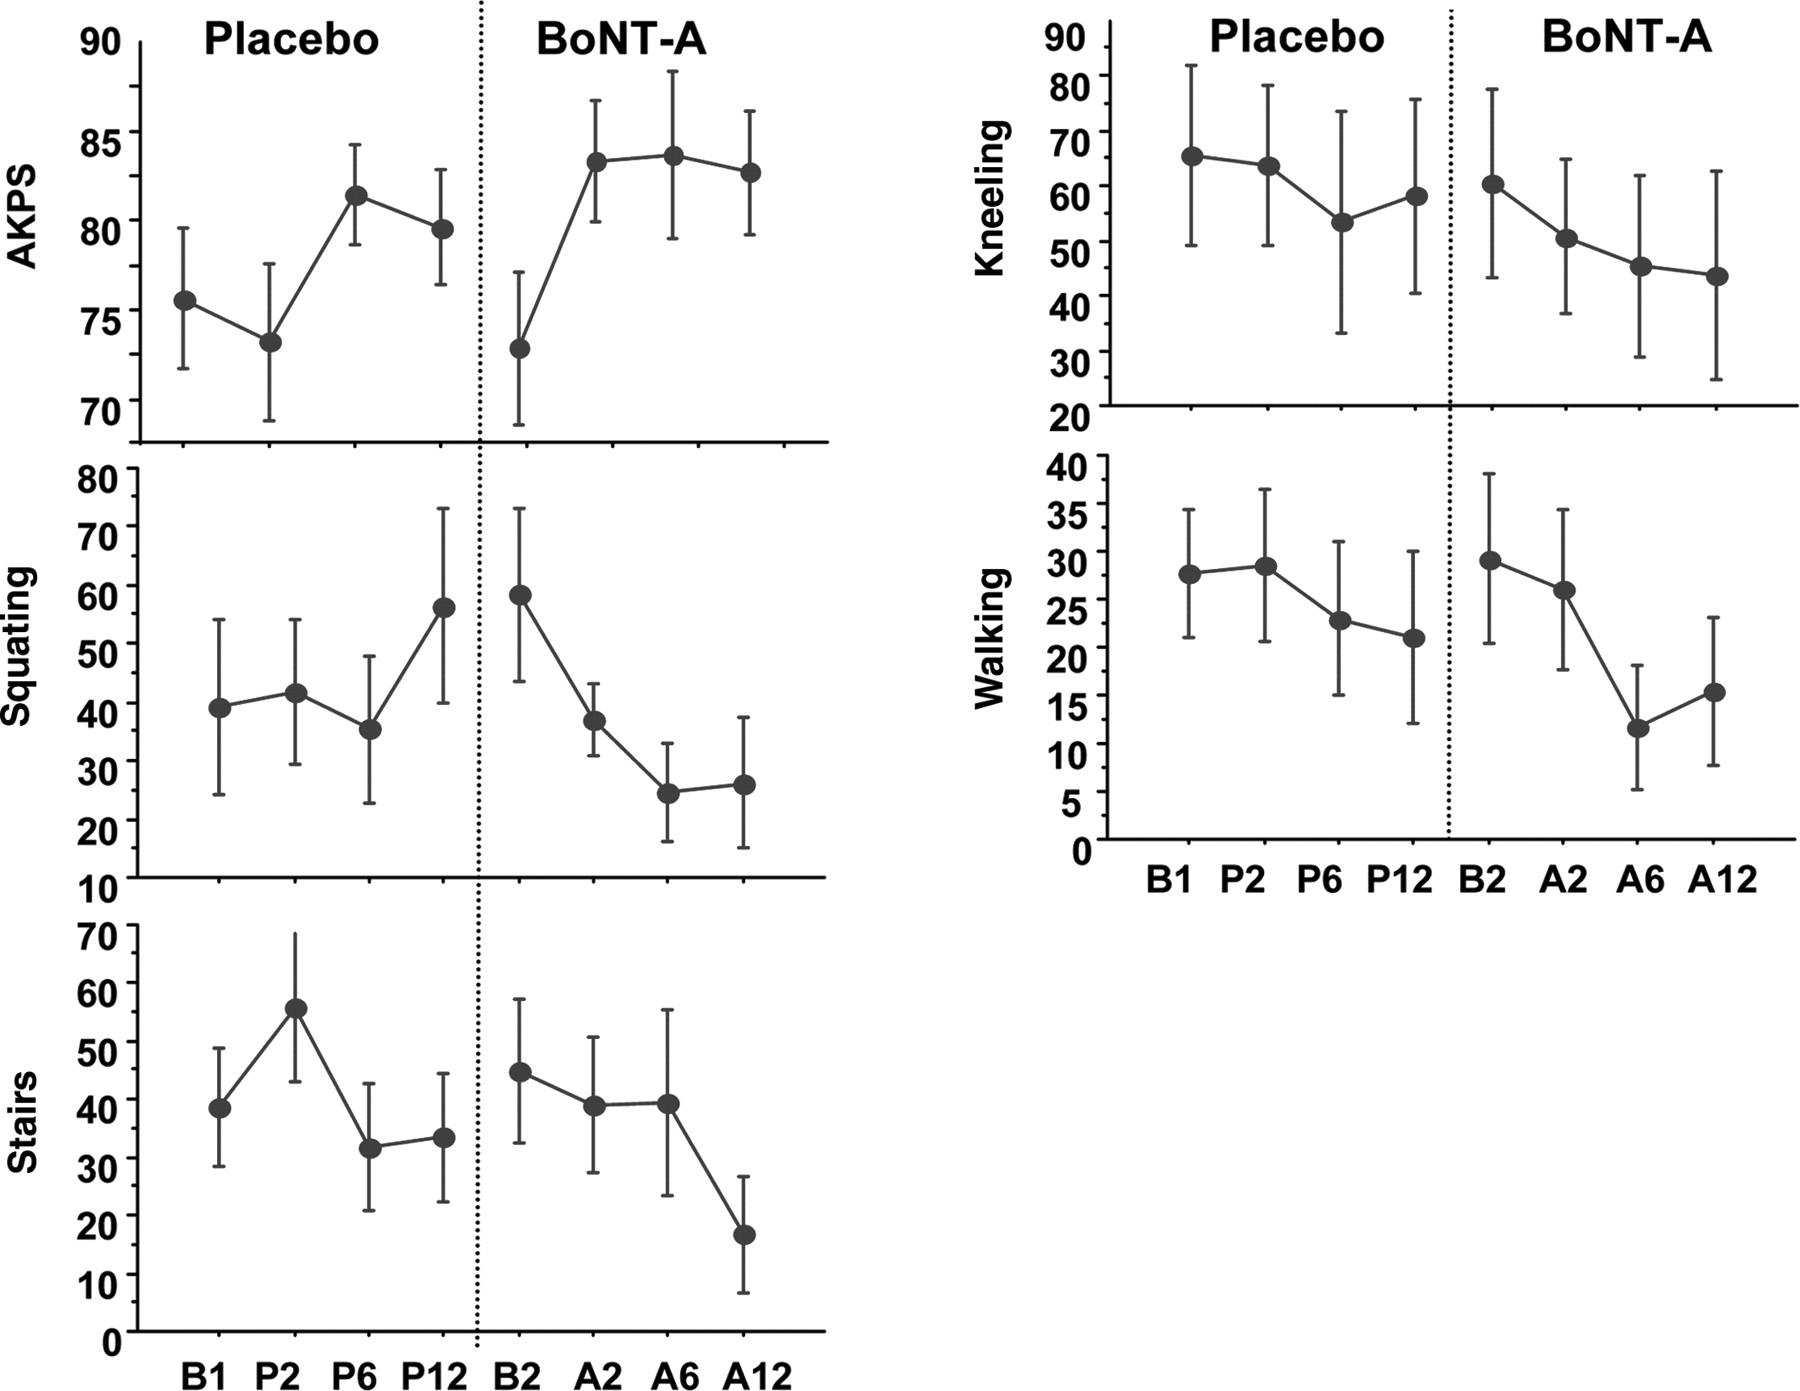 Treatment of refractory anterior knee pain using botulinum